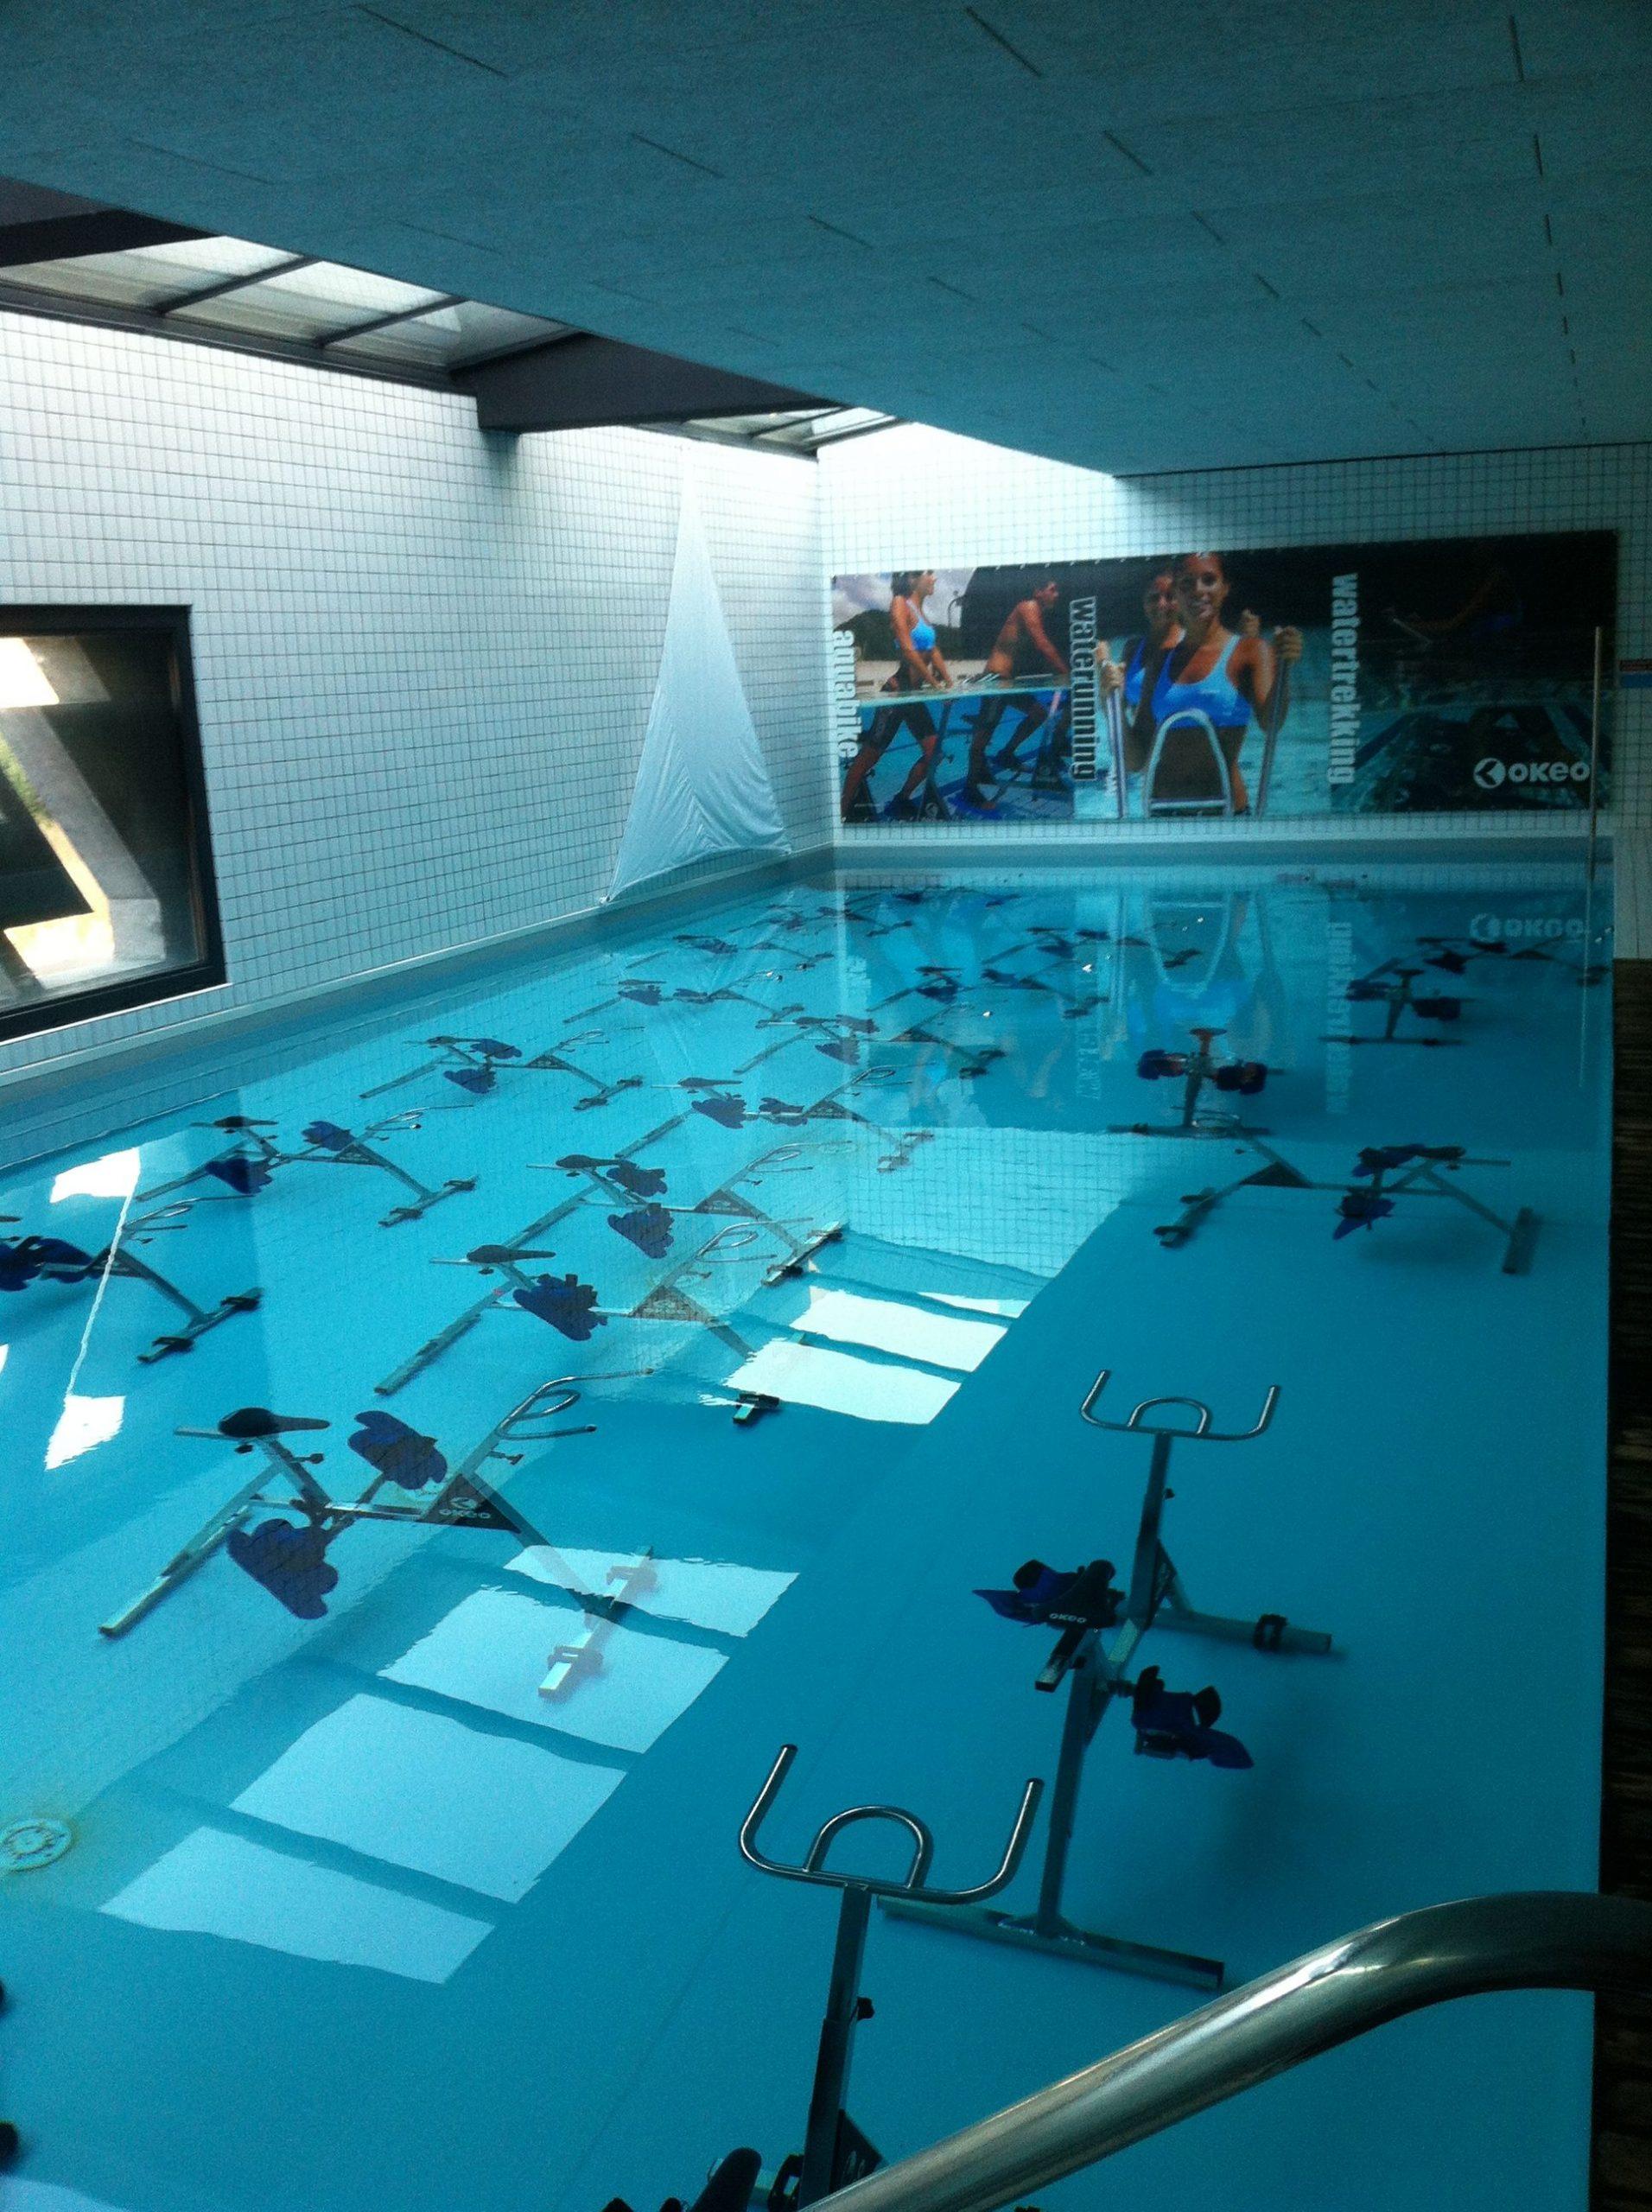 Bassin Aquabiking | Gym Facilities, Swimming Pools, Workout ... à Piscine Les Milles